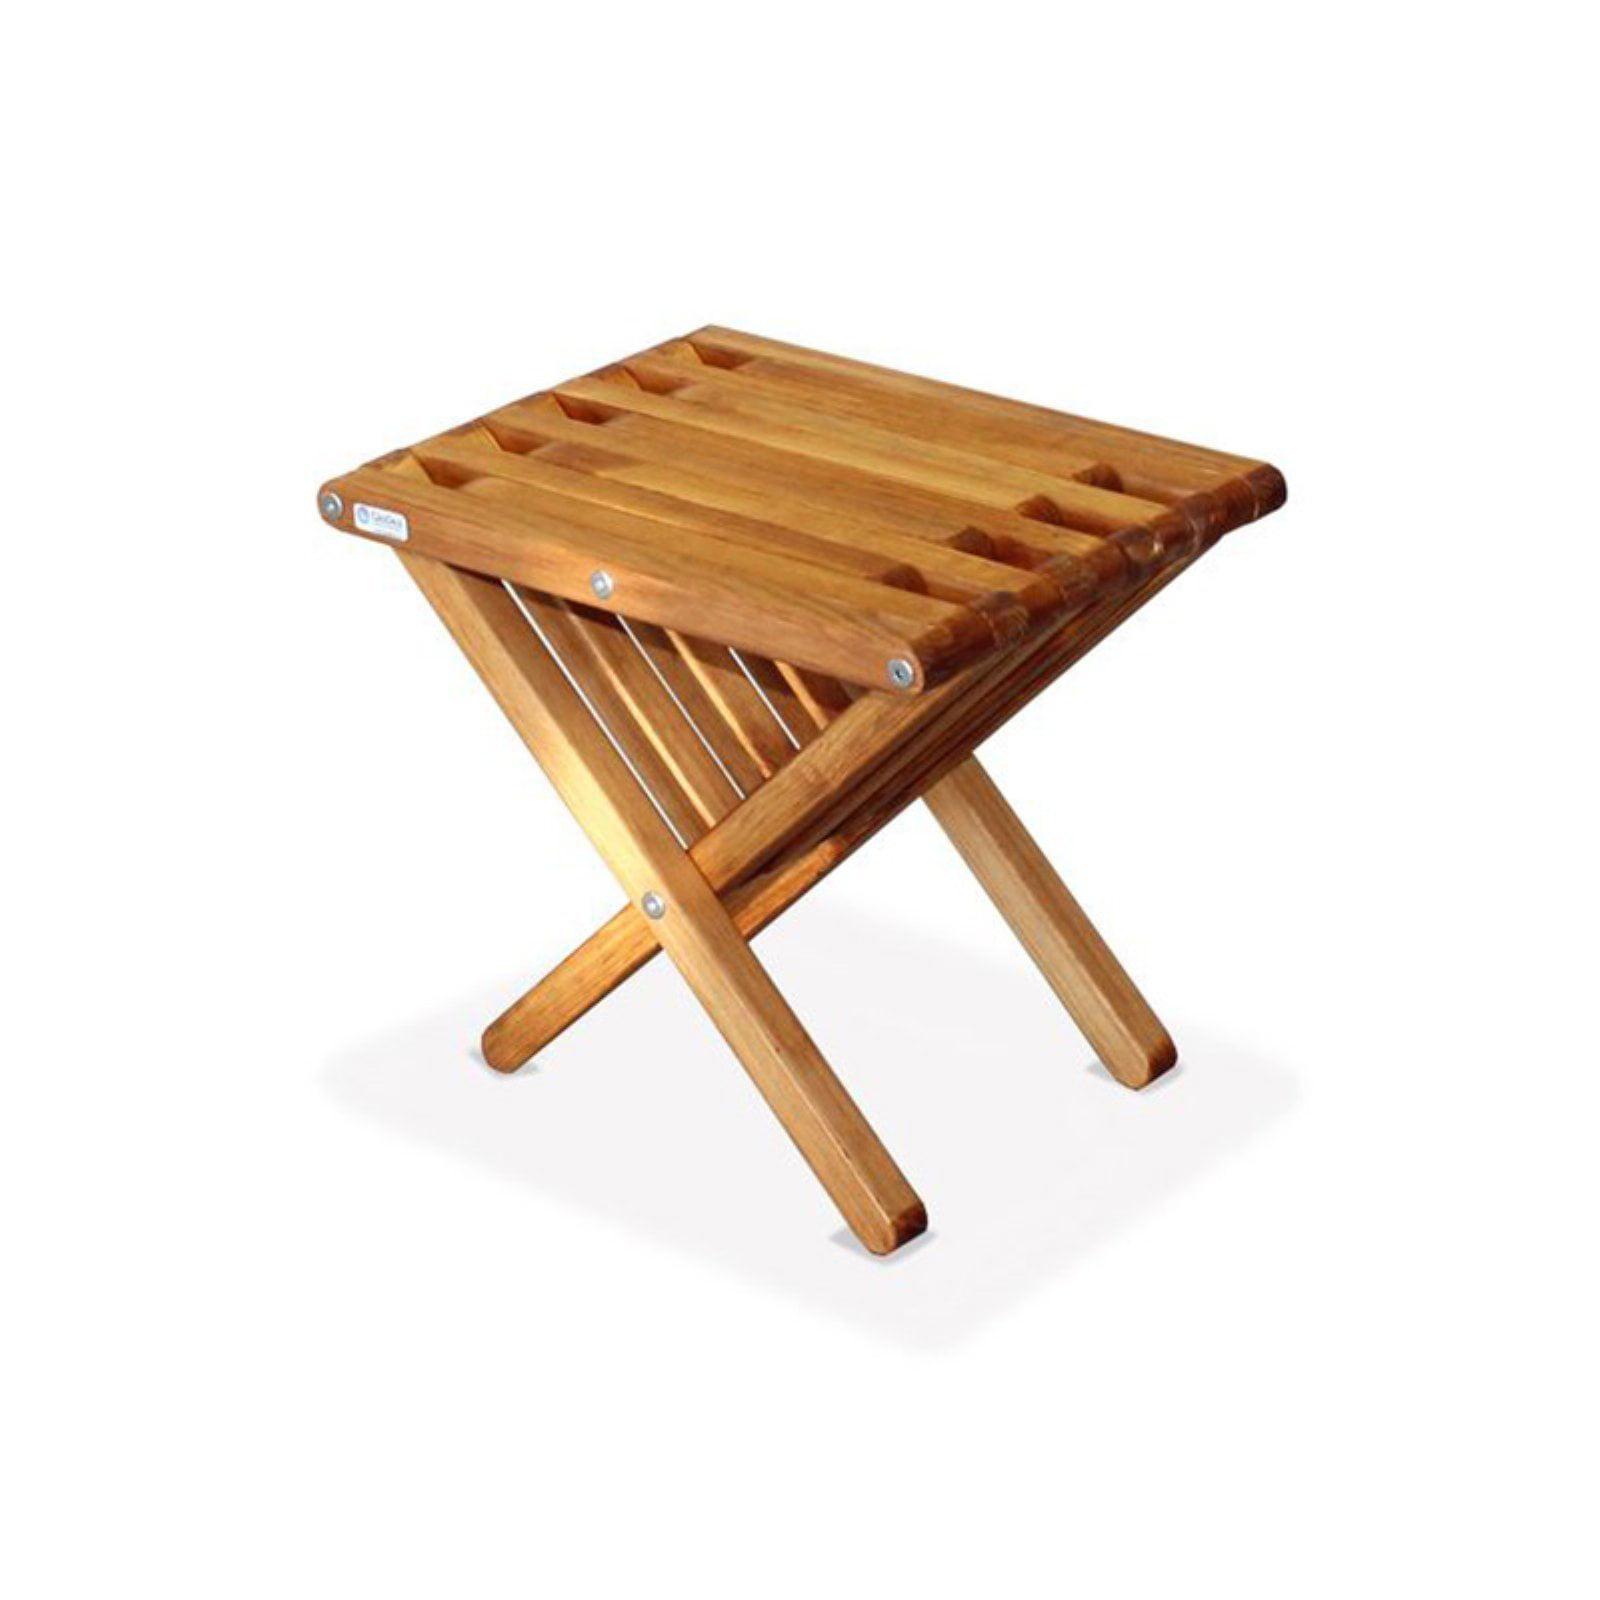 Beau GloDea Xquare X36 Short Wooden Patio End Table